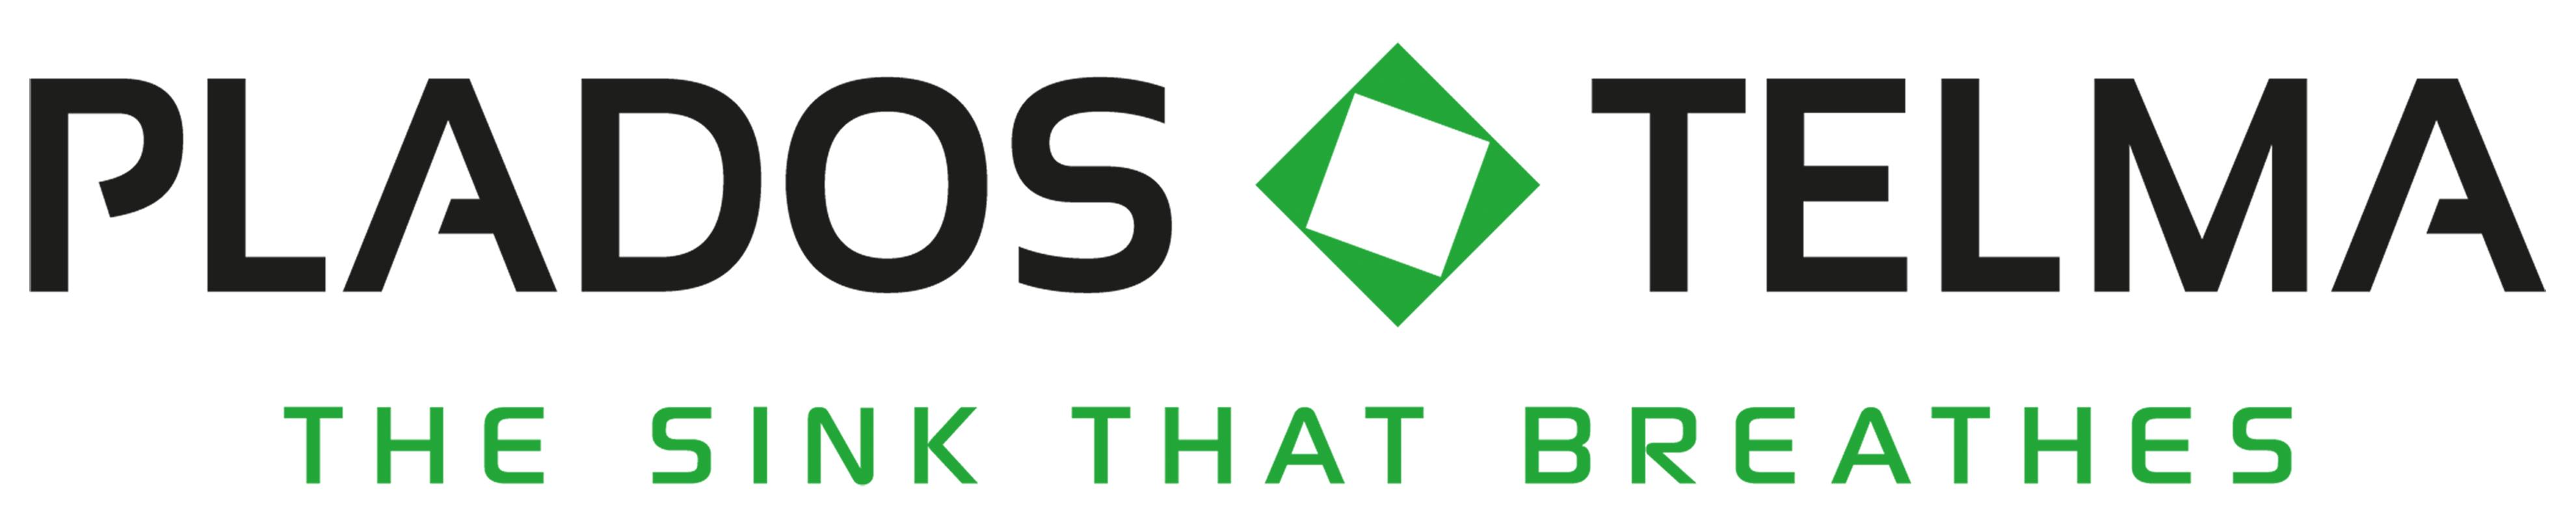 plados_telma_logo